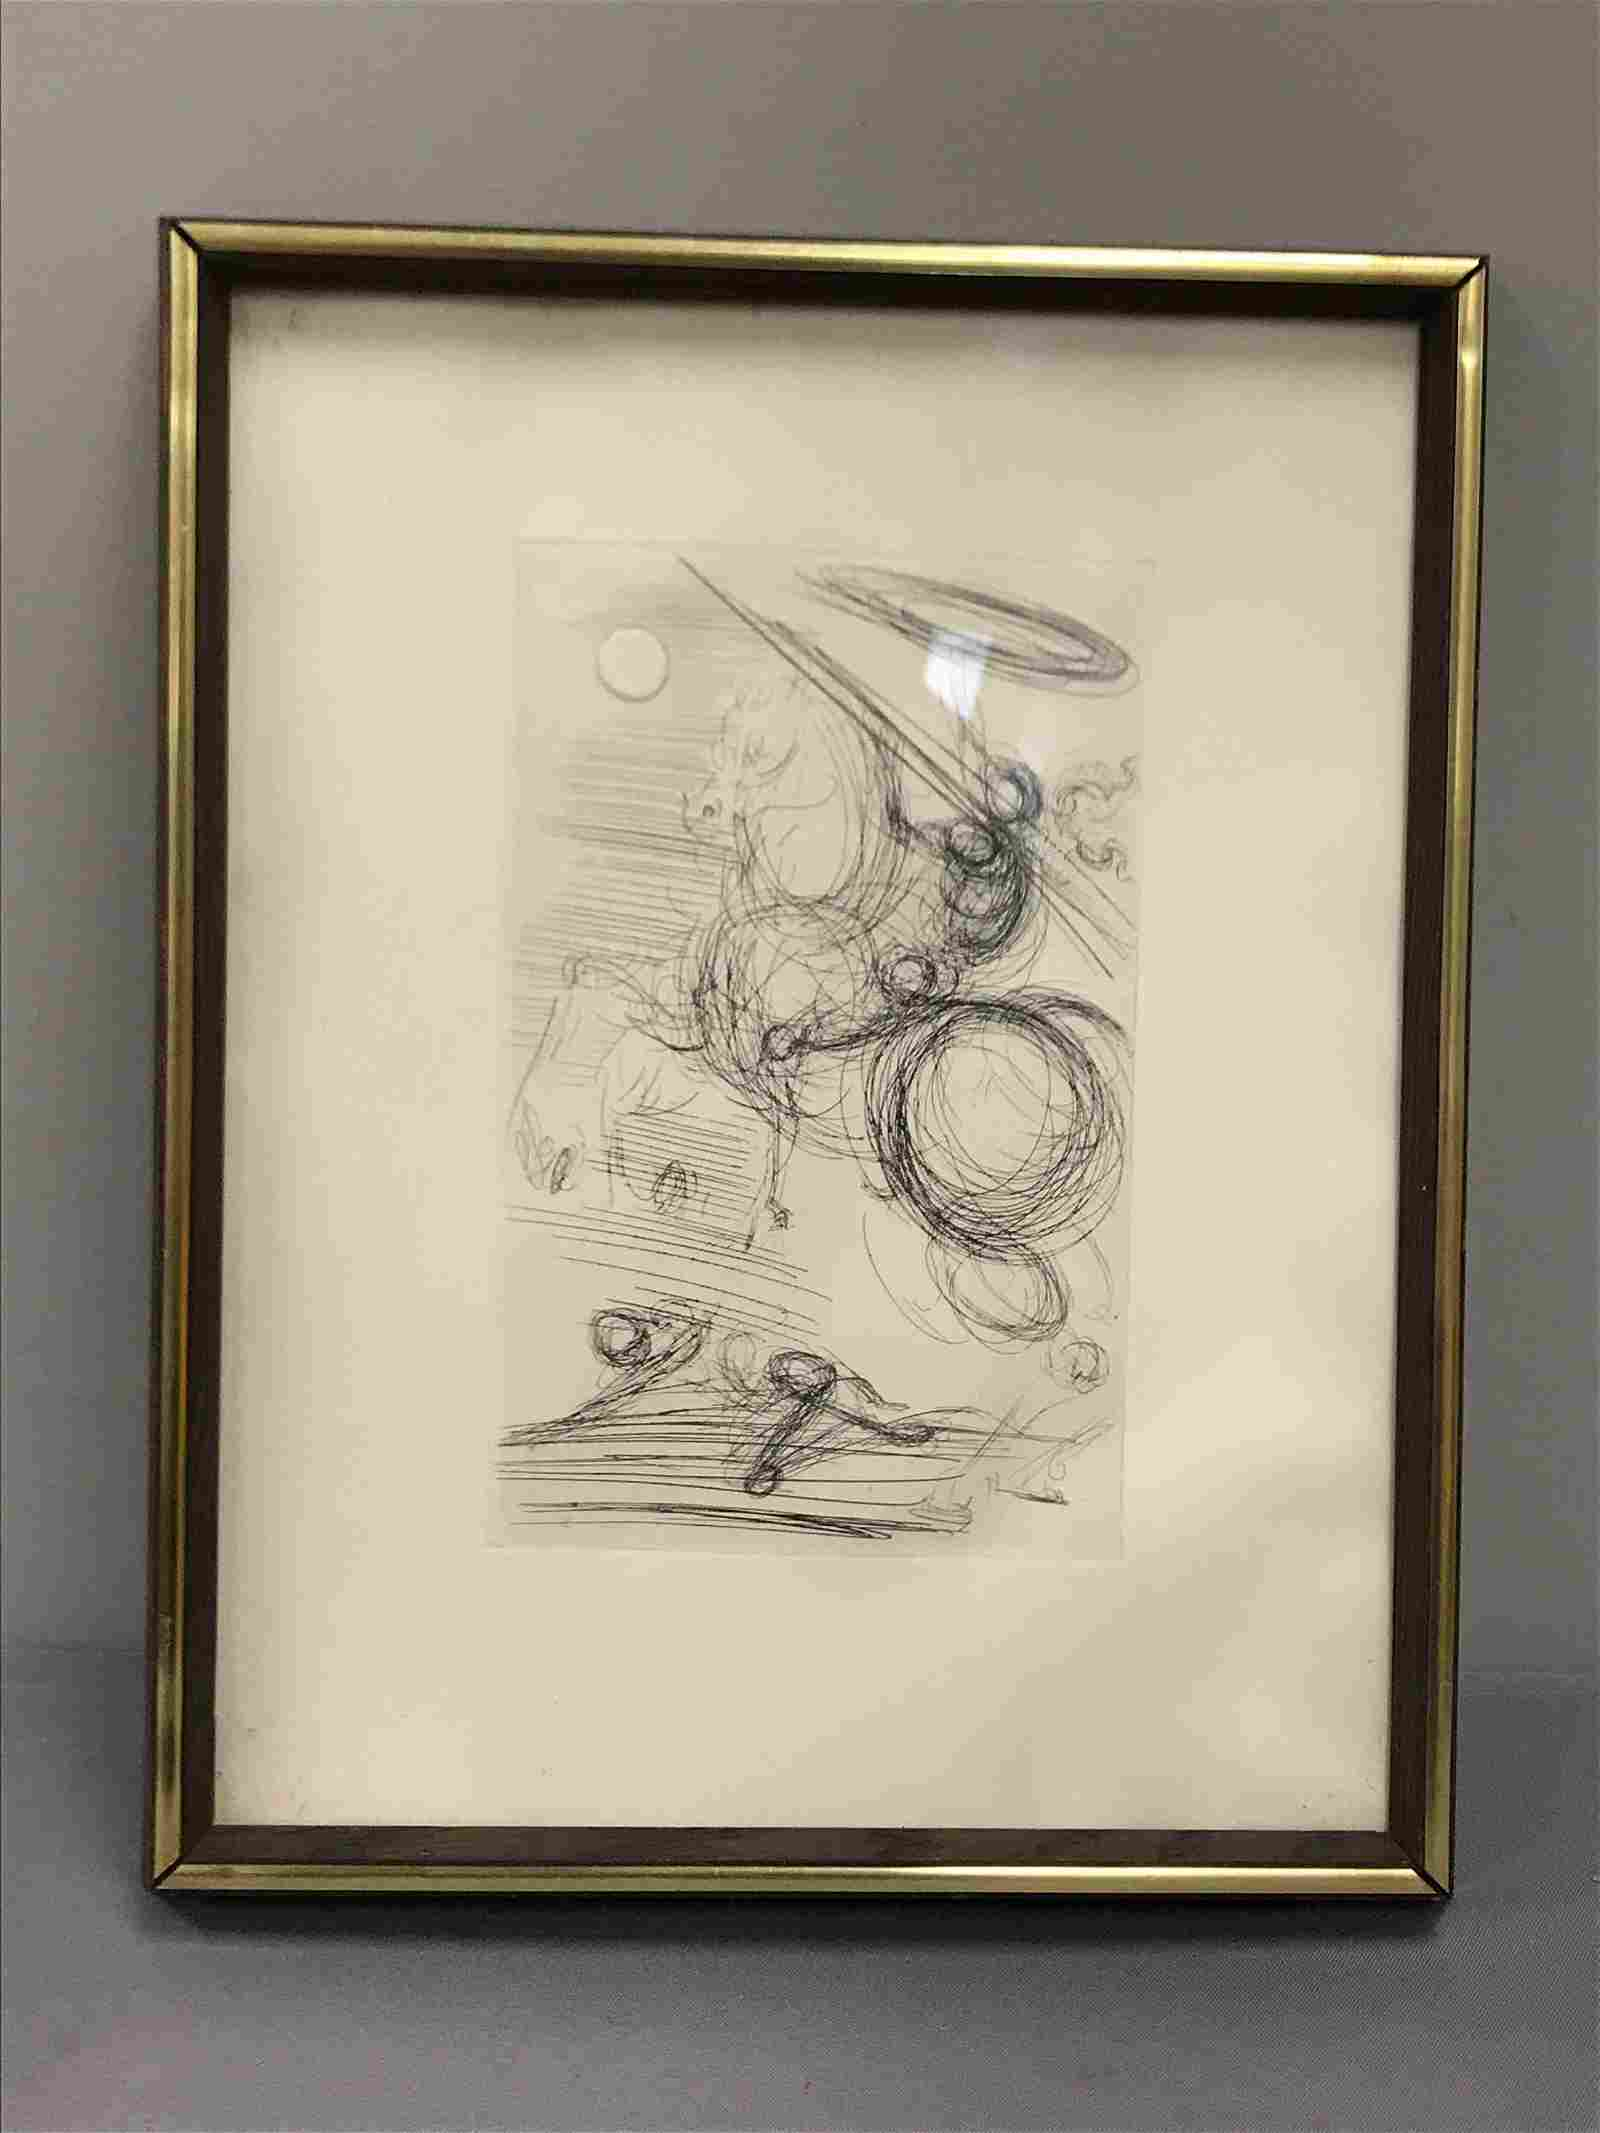 Framed Artwork etching Don Quixote Salvador Dali